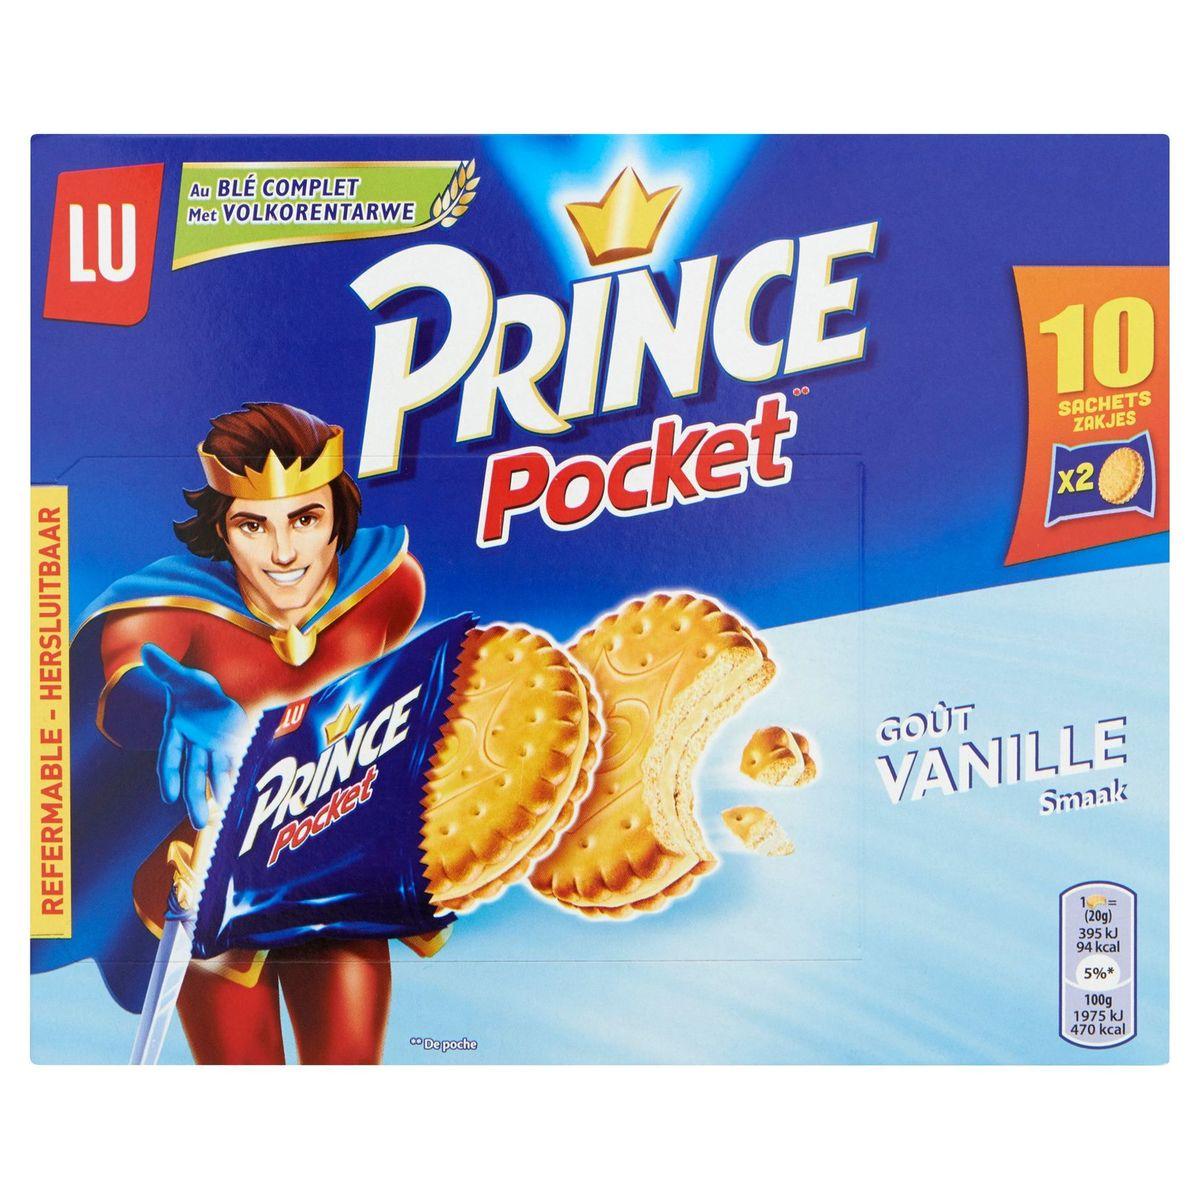 LU Prince Pocket Goût Vanille 10 x 40 g